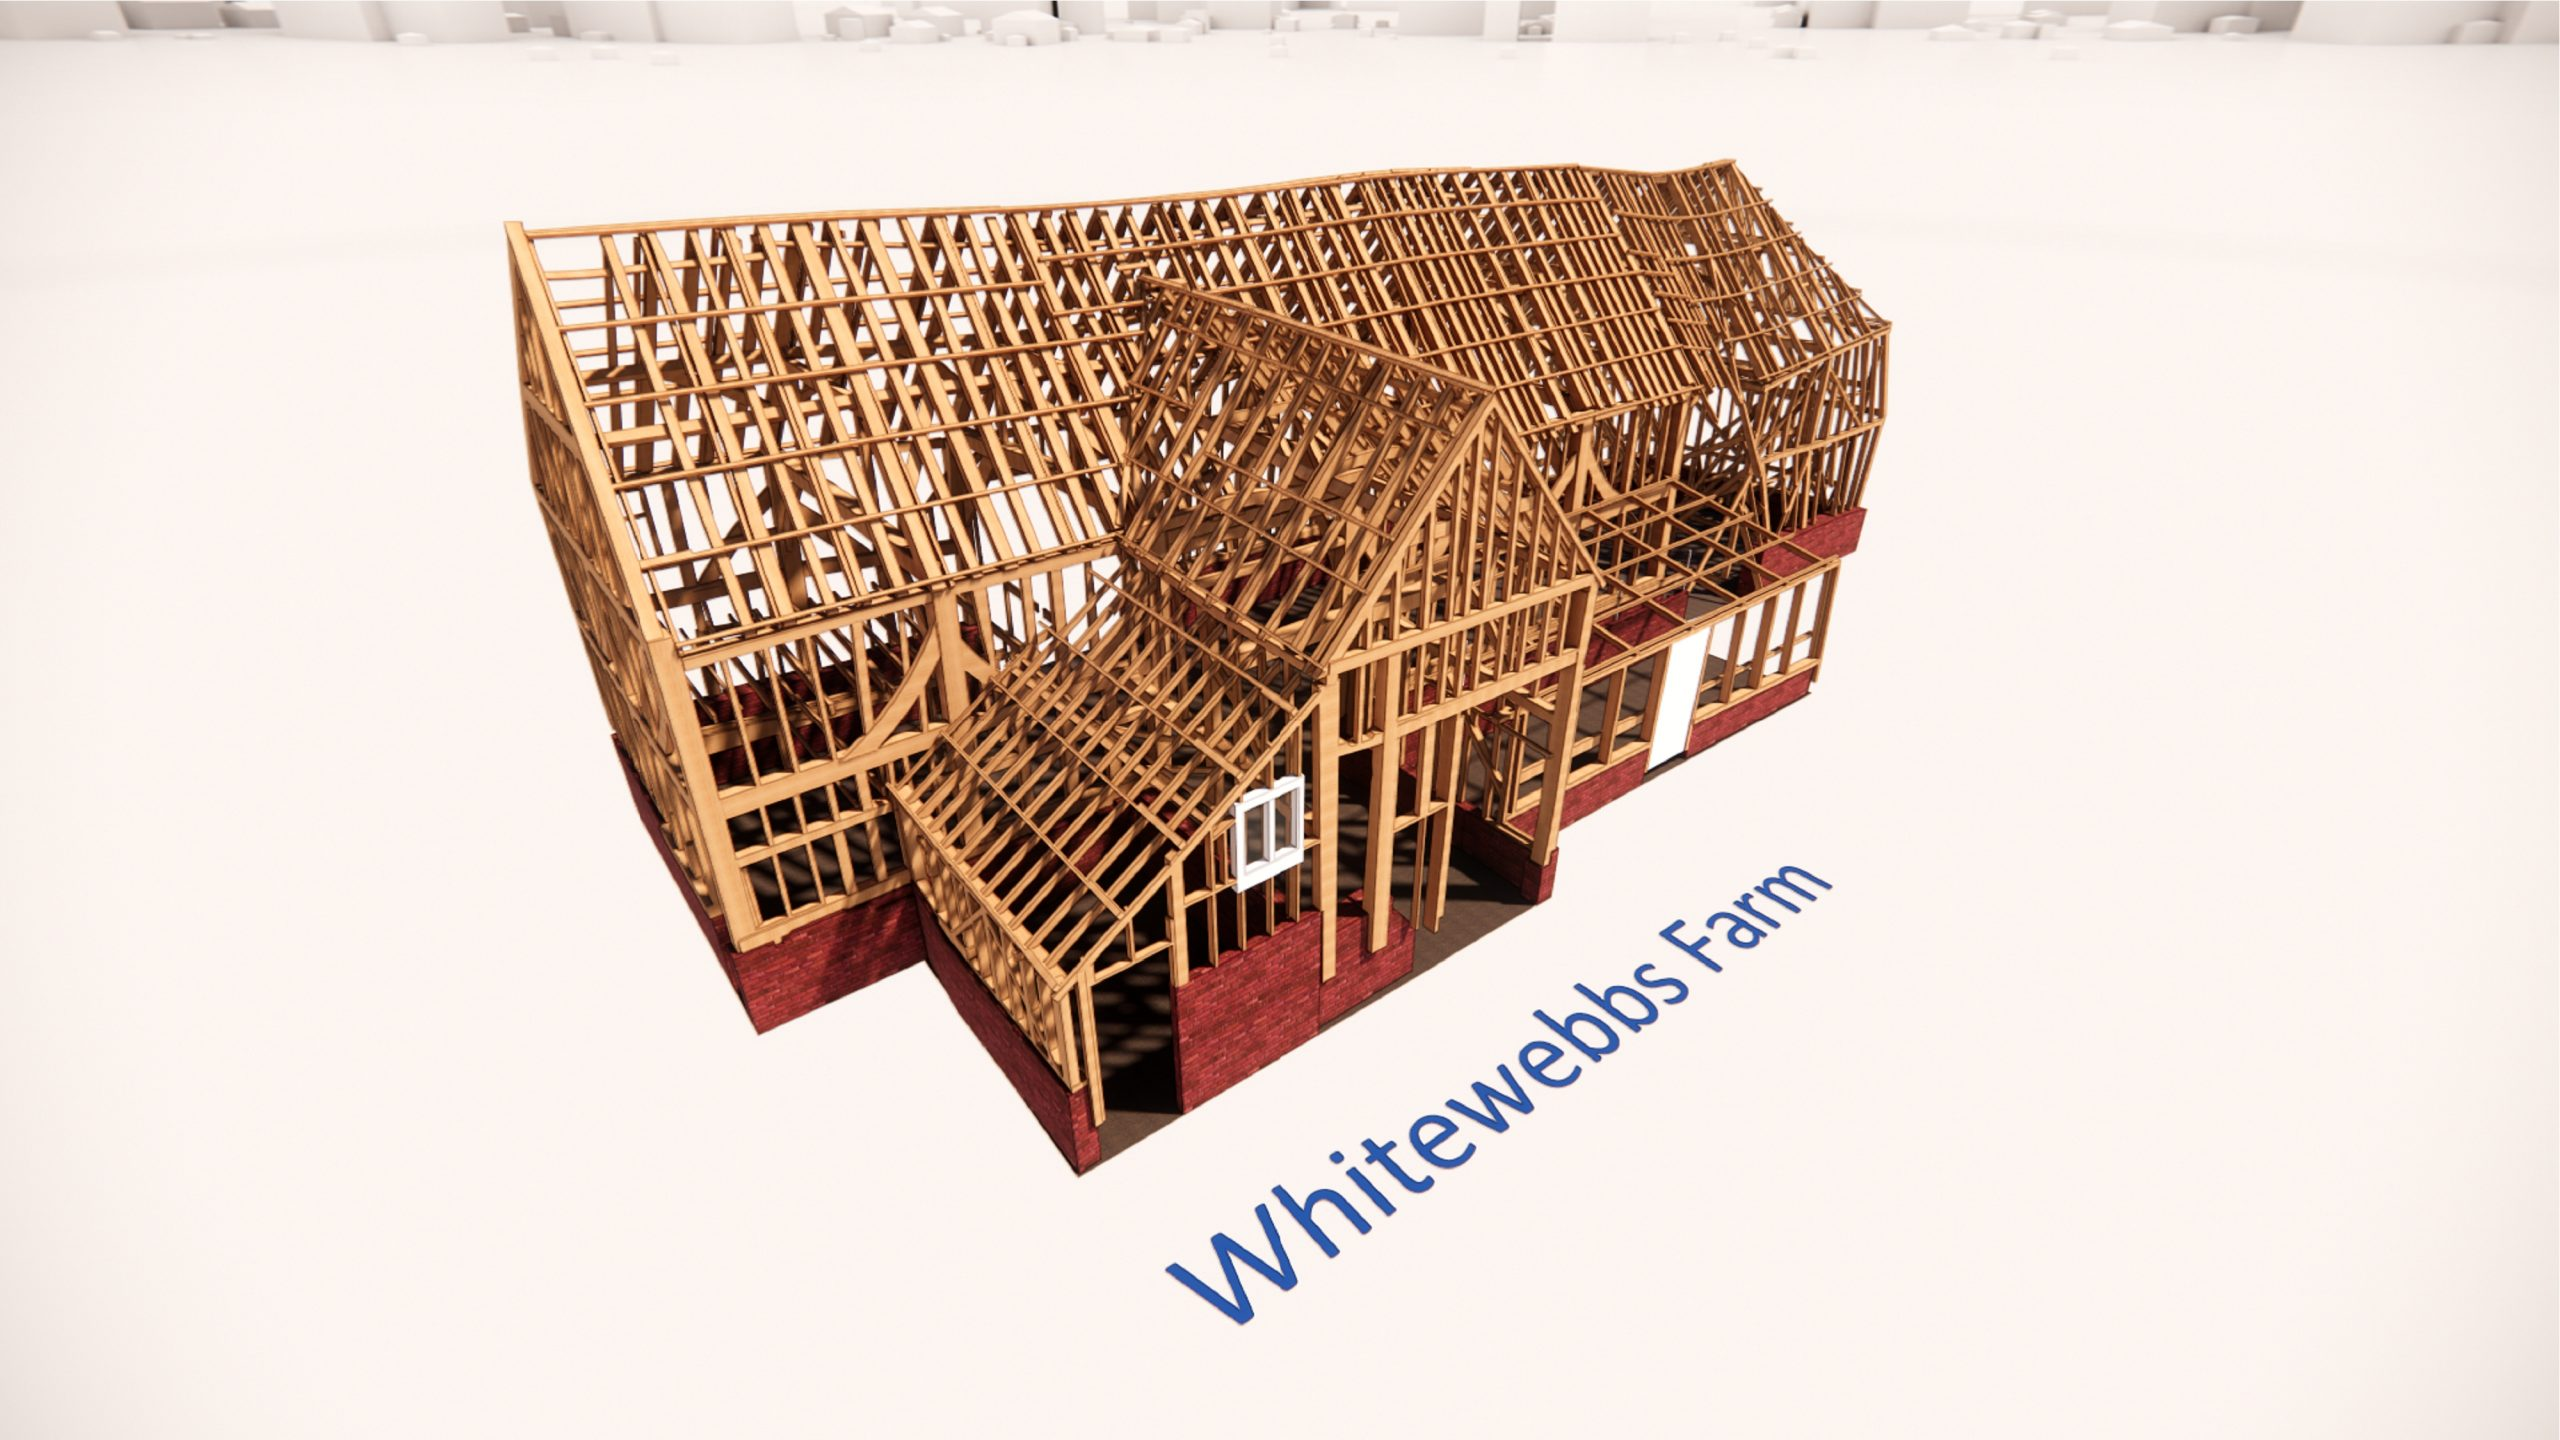 Rendering of Whitewebbs Farm construction